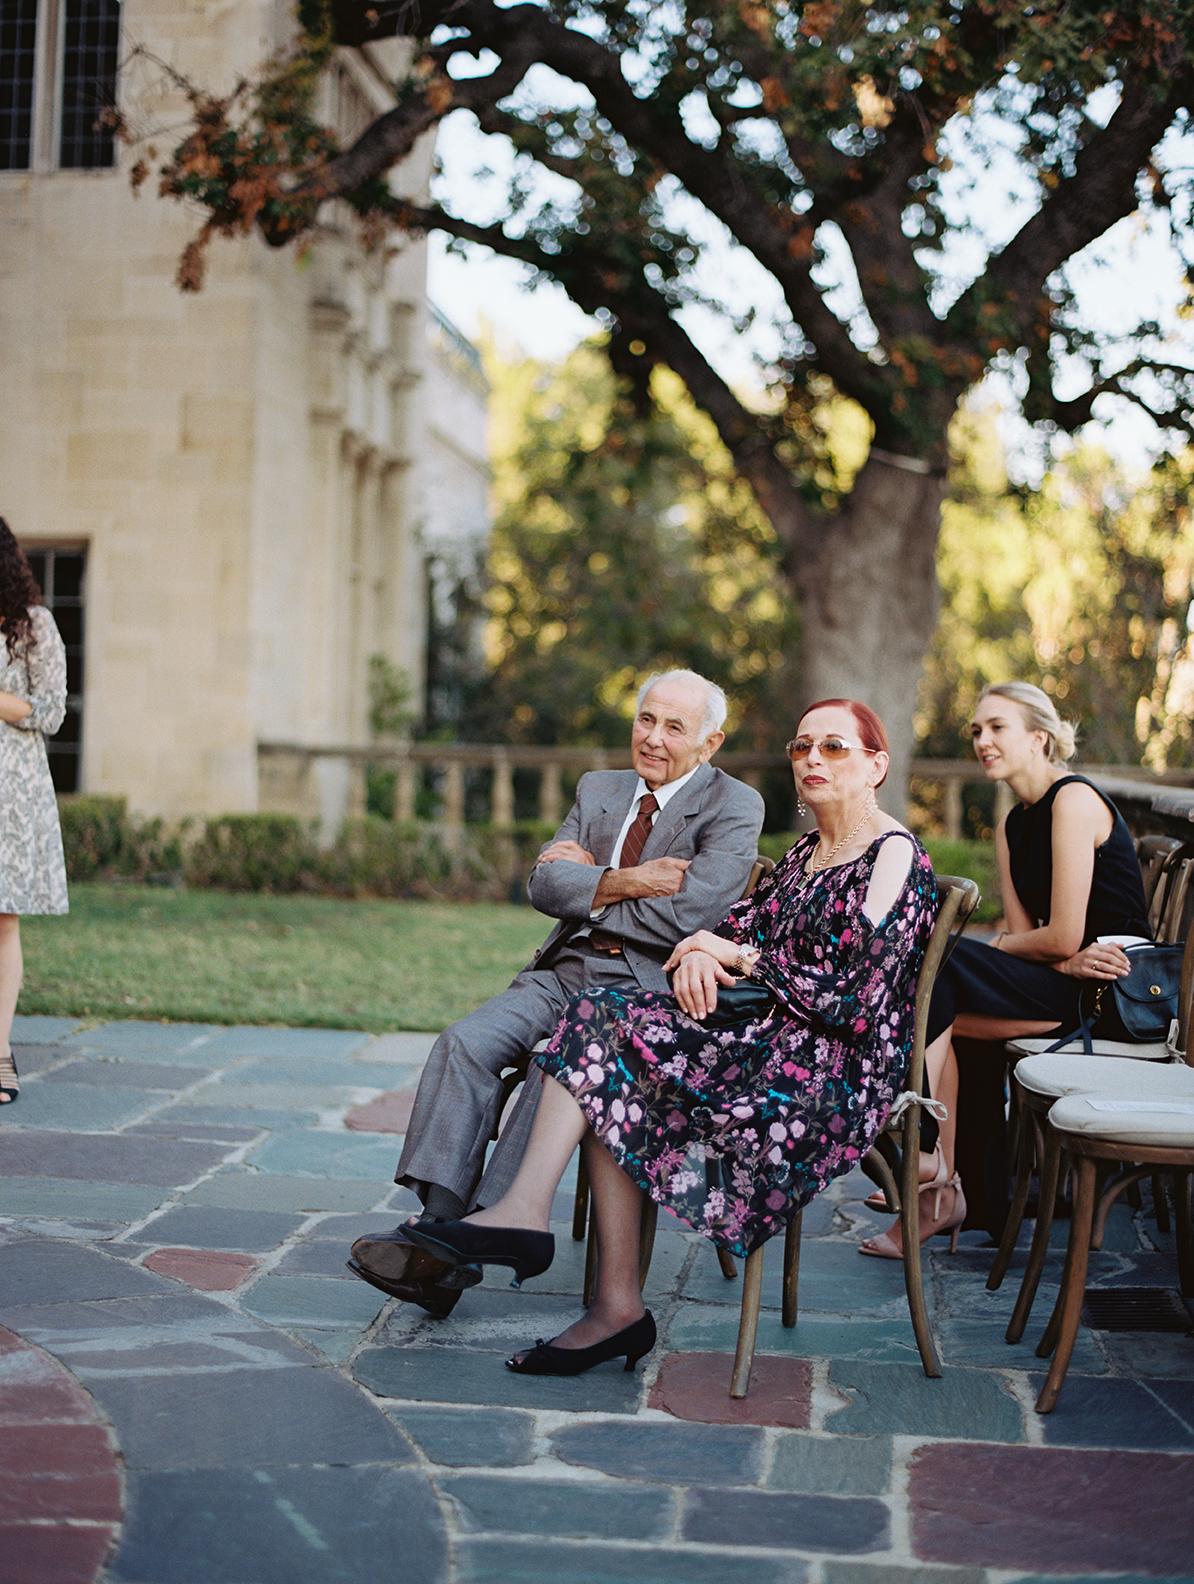 205-brian-sarra-los-angeles-wedding-brumley-wells-photography.jpg